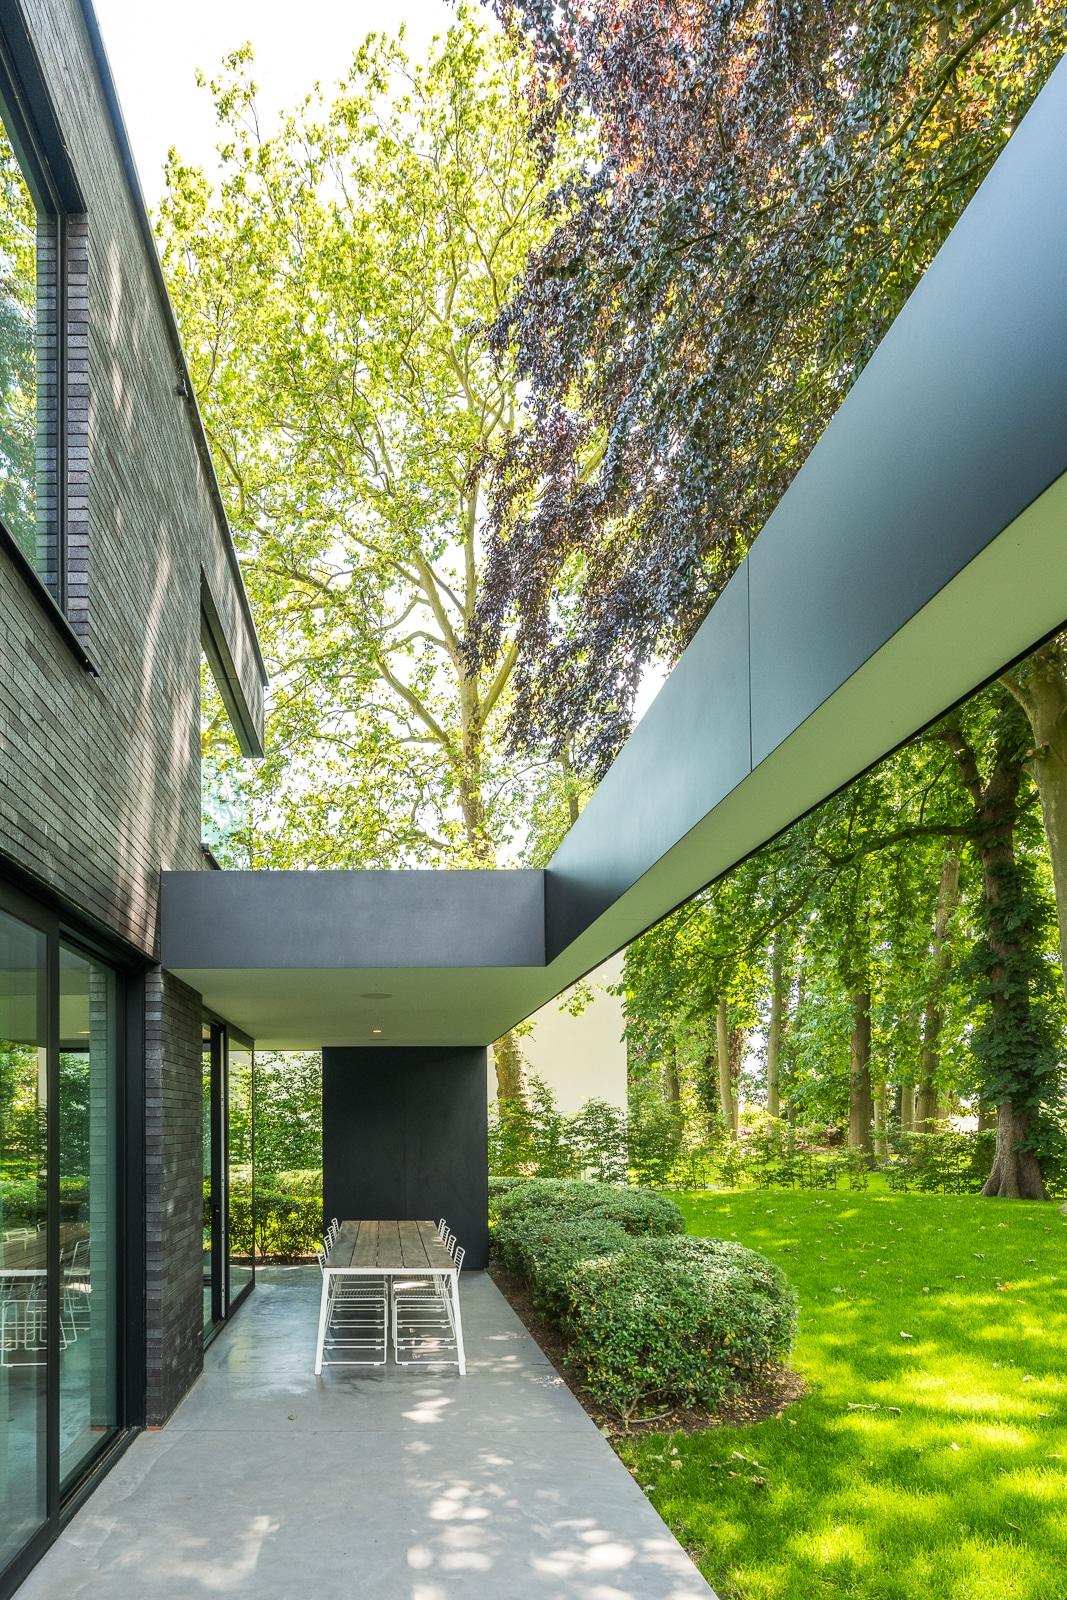 BaeyensBeck Kjell 015web | Baeyens & Beck architecten Gent | architect nieuwbouw renovatie interieur | high end | architectenbureau